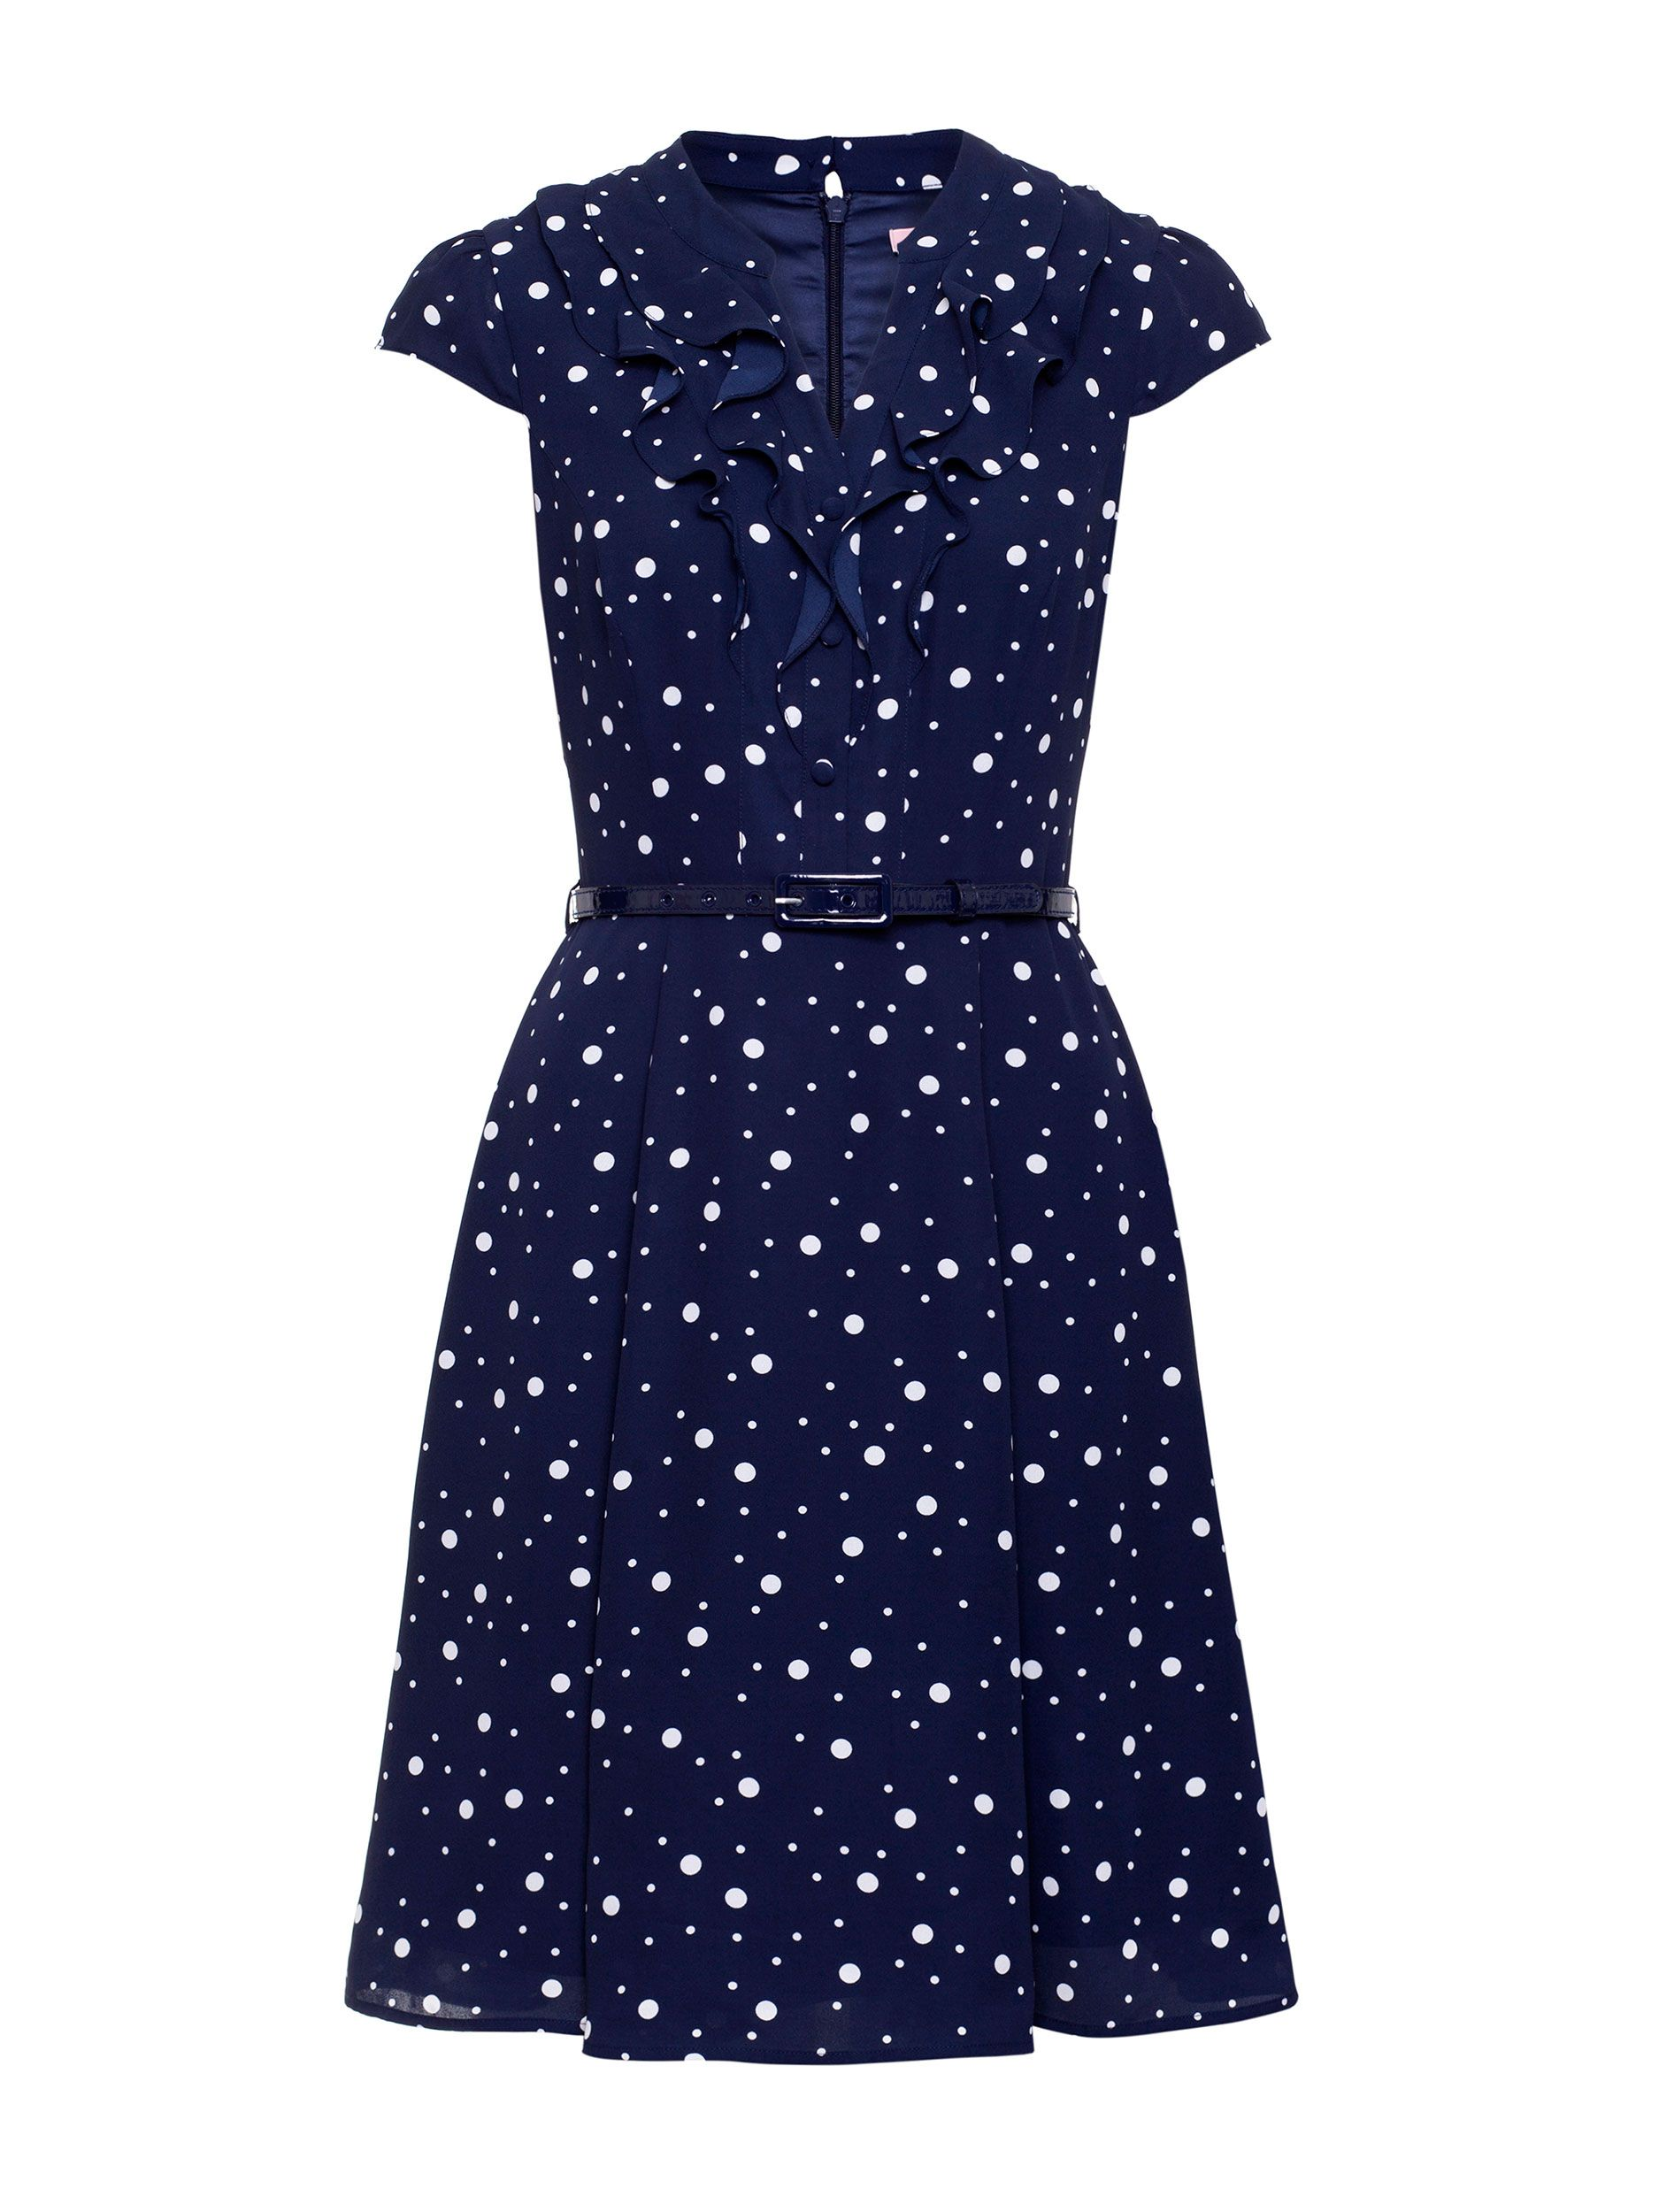 Happy Dress | Daywear | Review Australia | vestidos | Pinterest ...